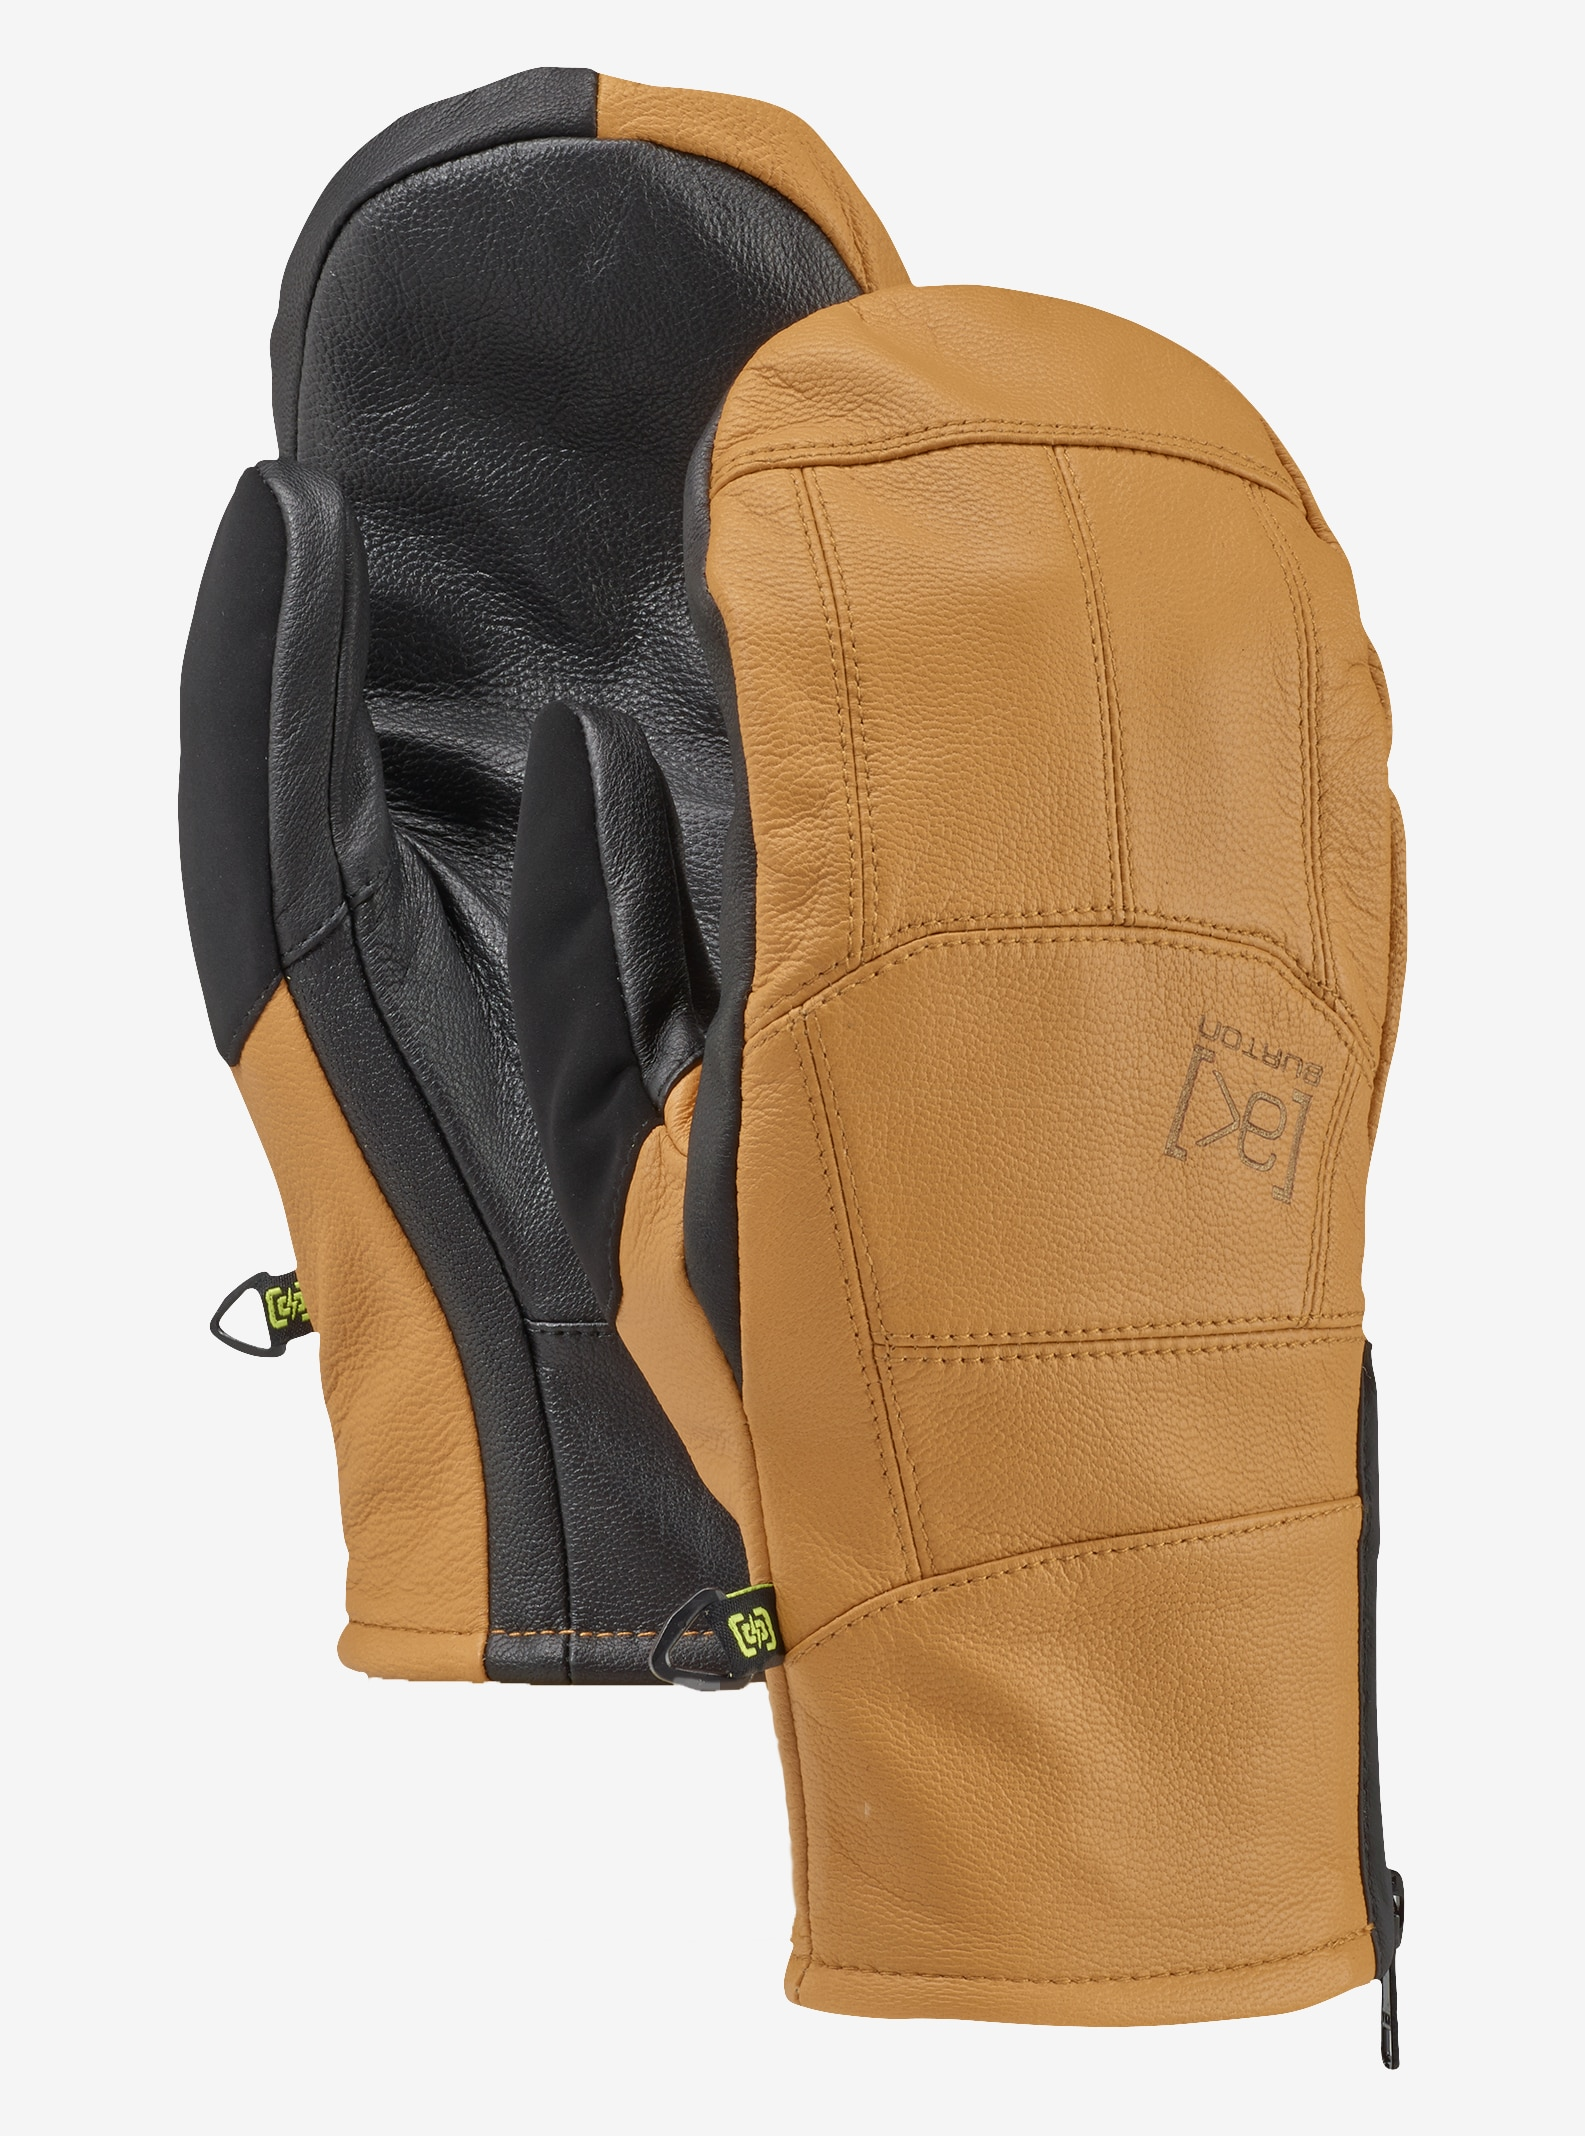 Burton [ak] Leather Tech Mitt shown in Raw Hide